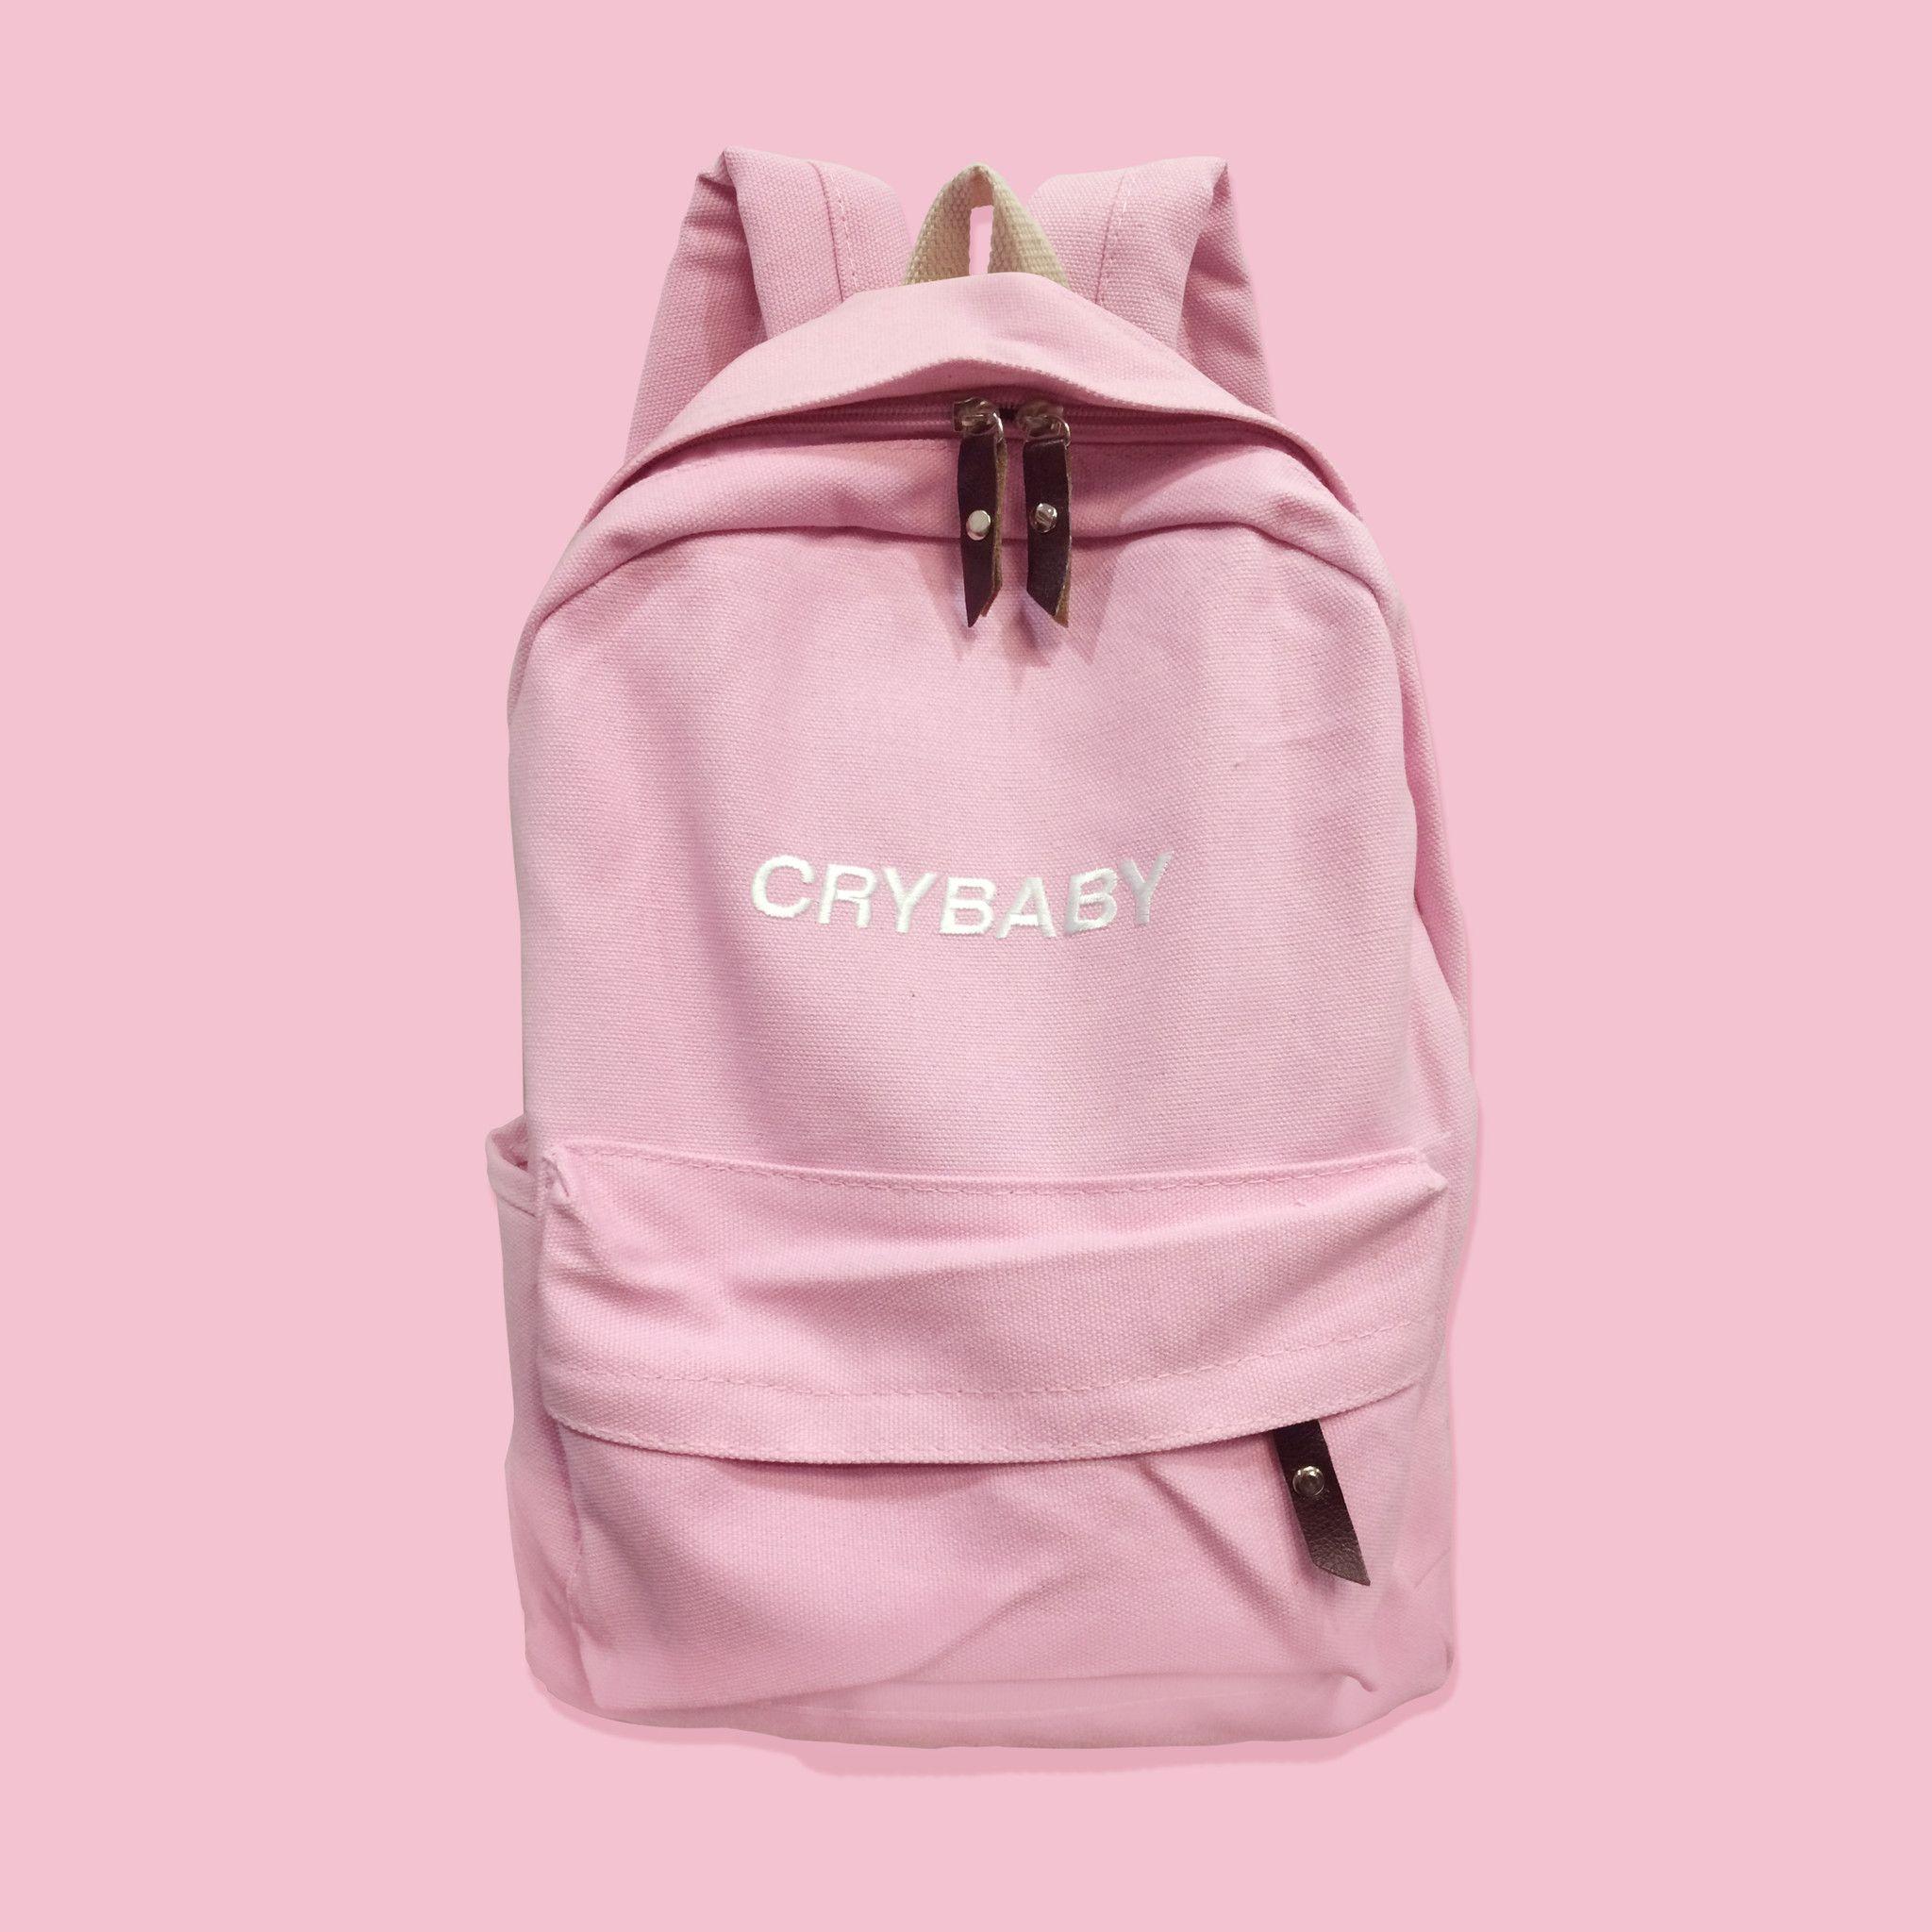 crybaby tumblr aesthetic backpack wardrobe wishlist